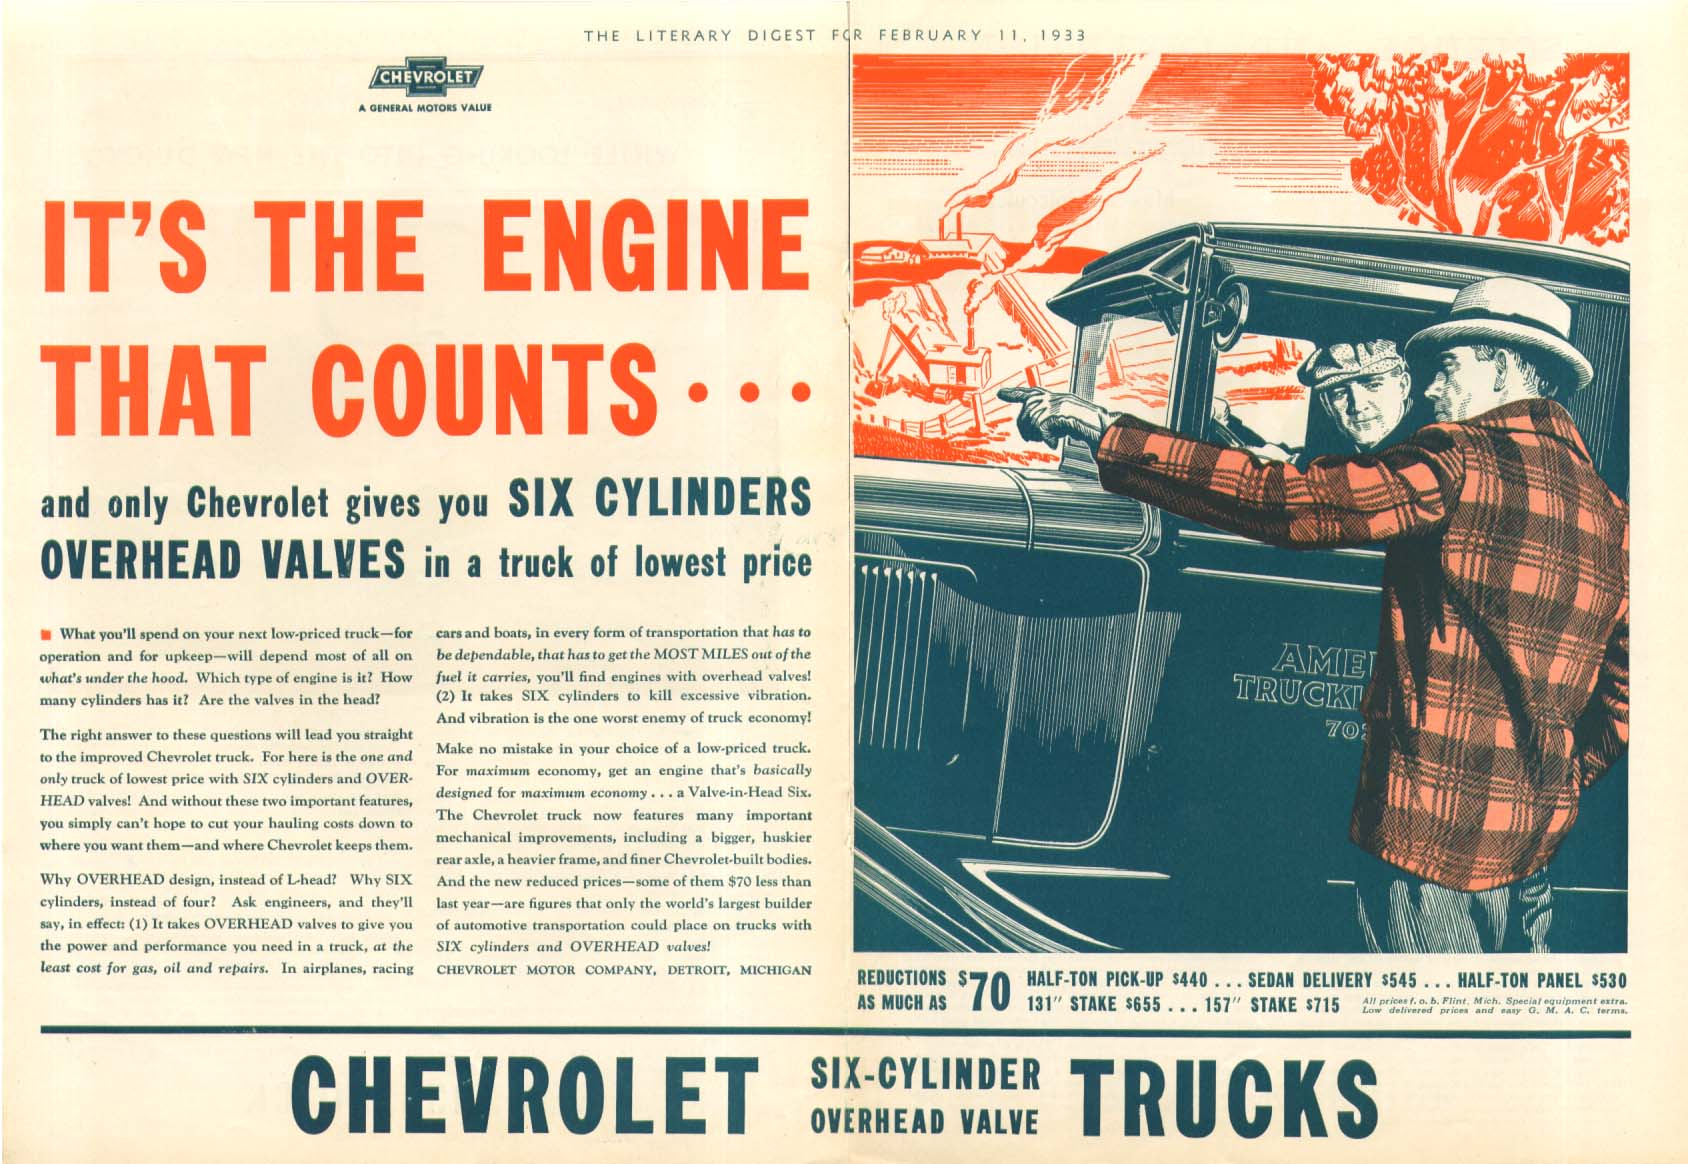 At 10,000 you've only begun Chevrolet Camel Cigarettes Sedan Delivery ad 1933